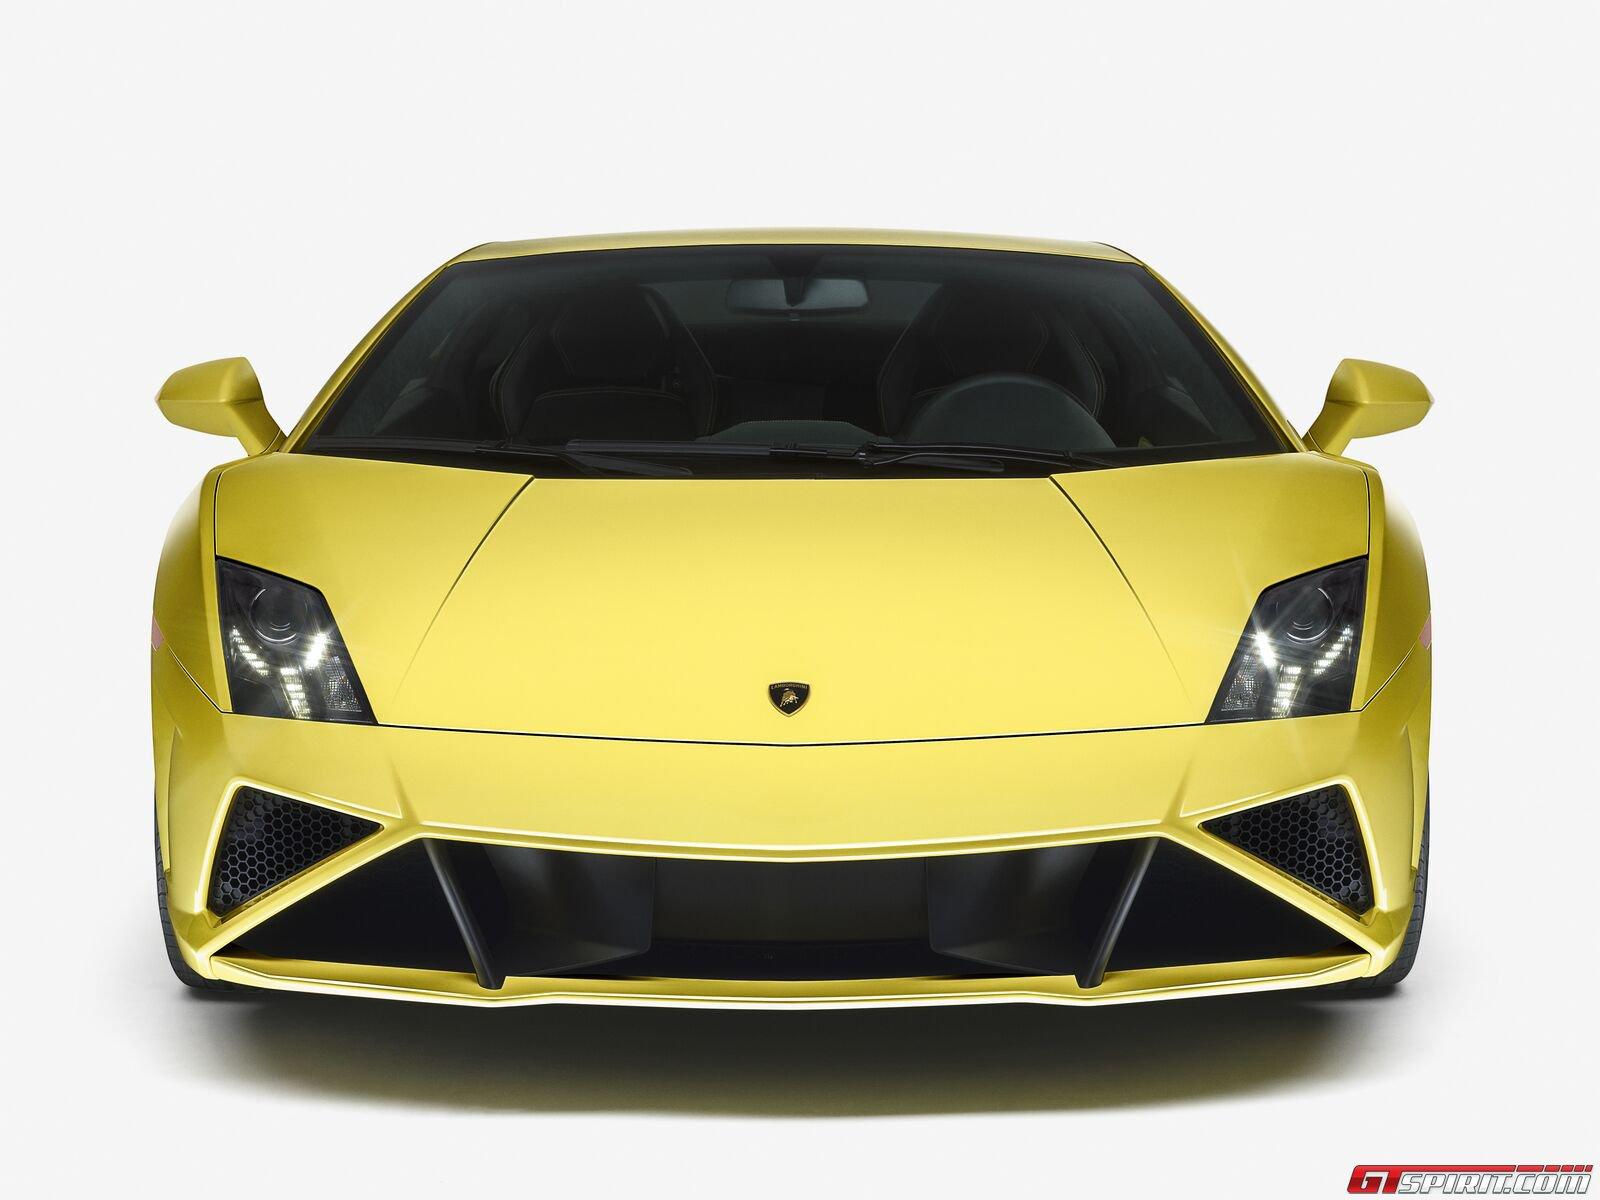 Lamborghini Gallardo LP560-4 Facelift Photo 3